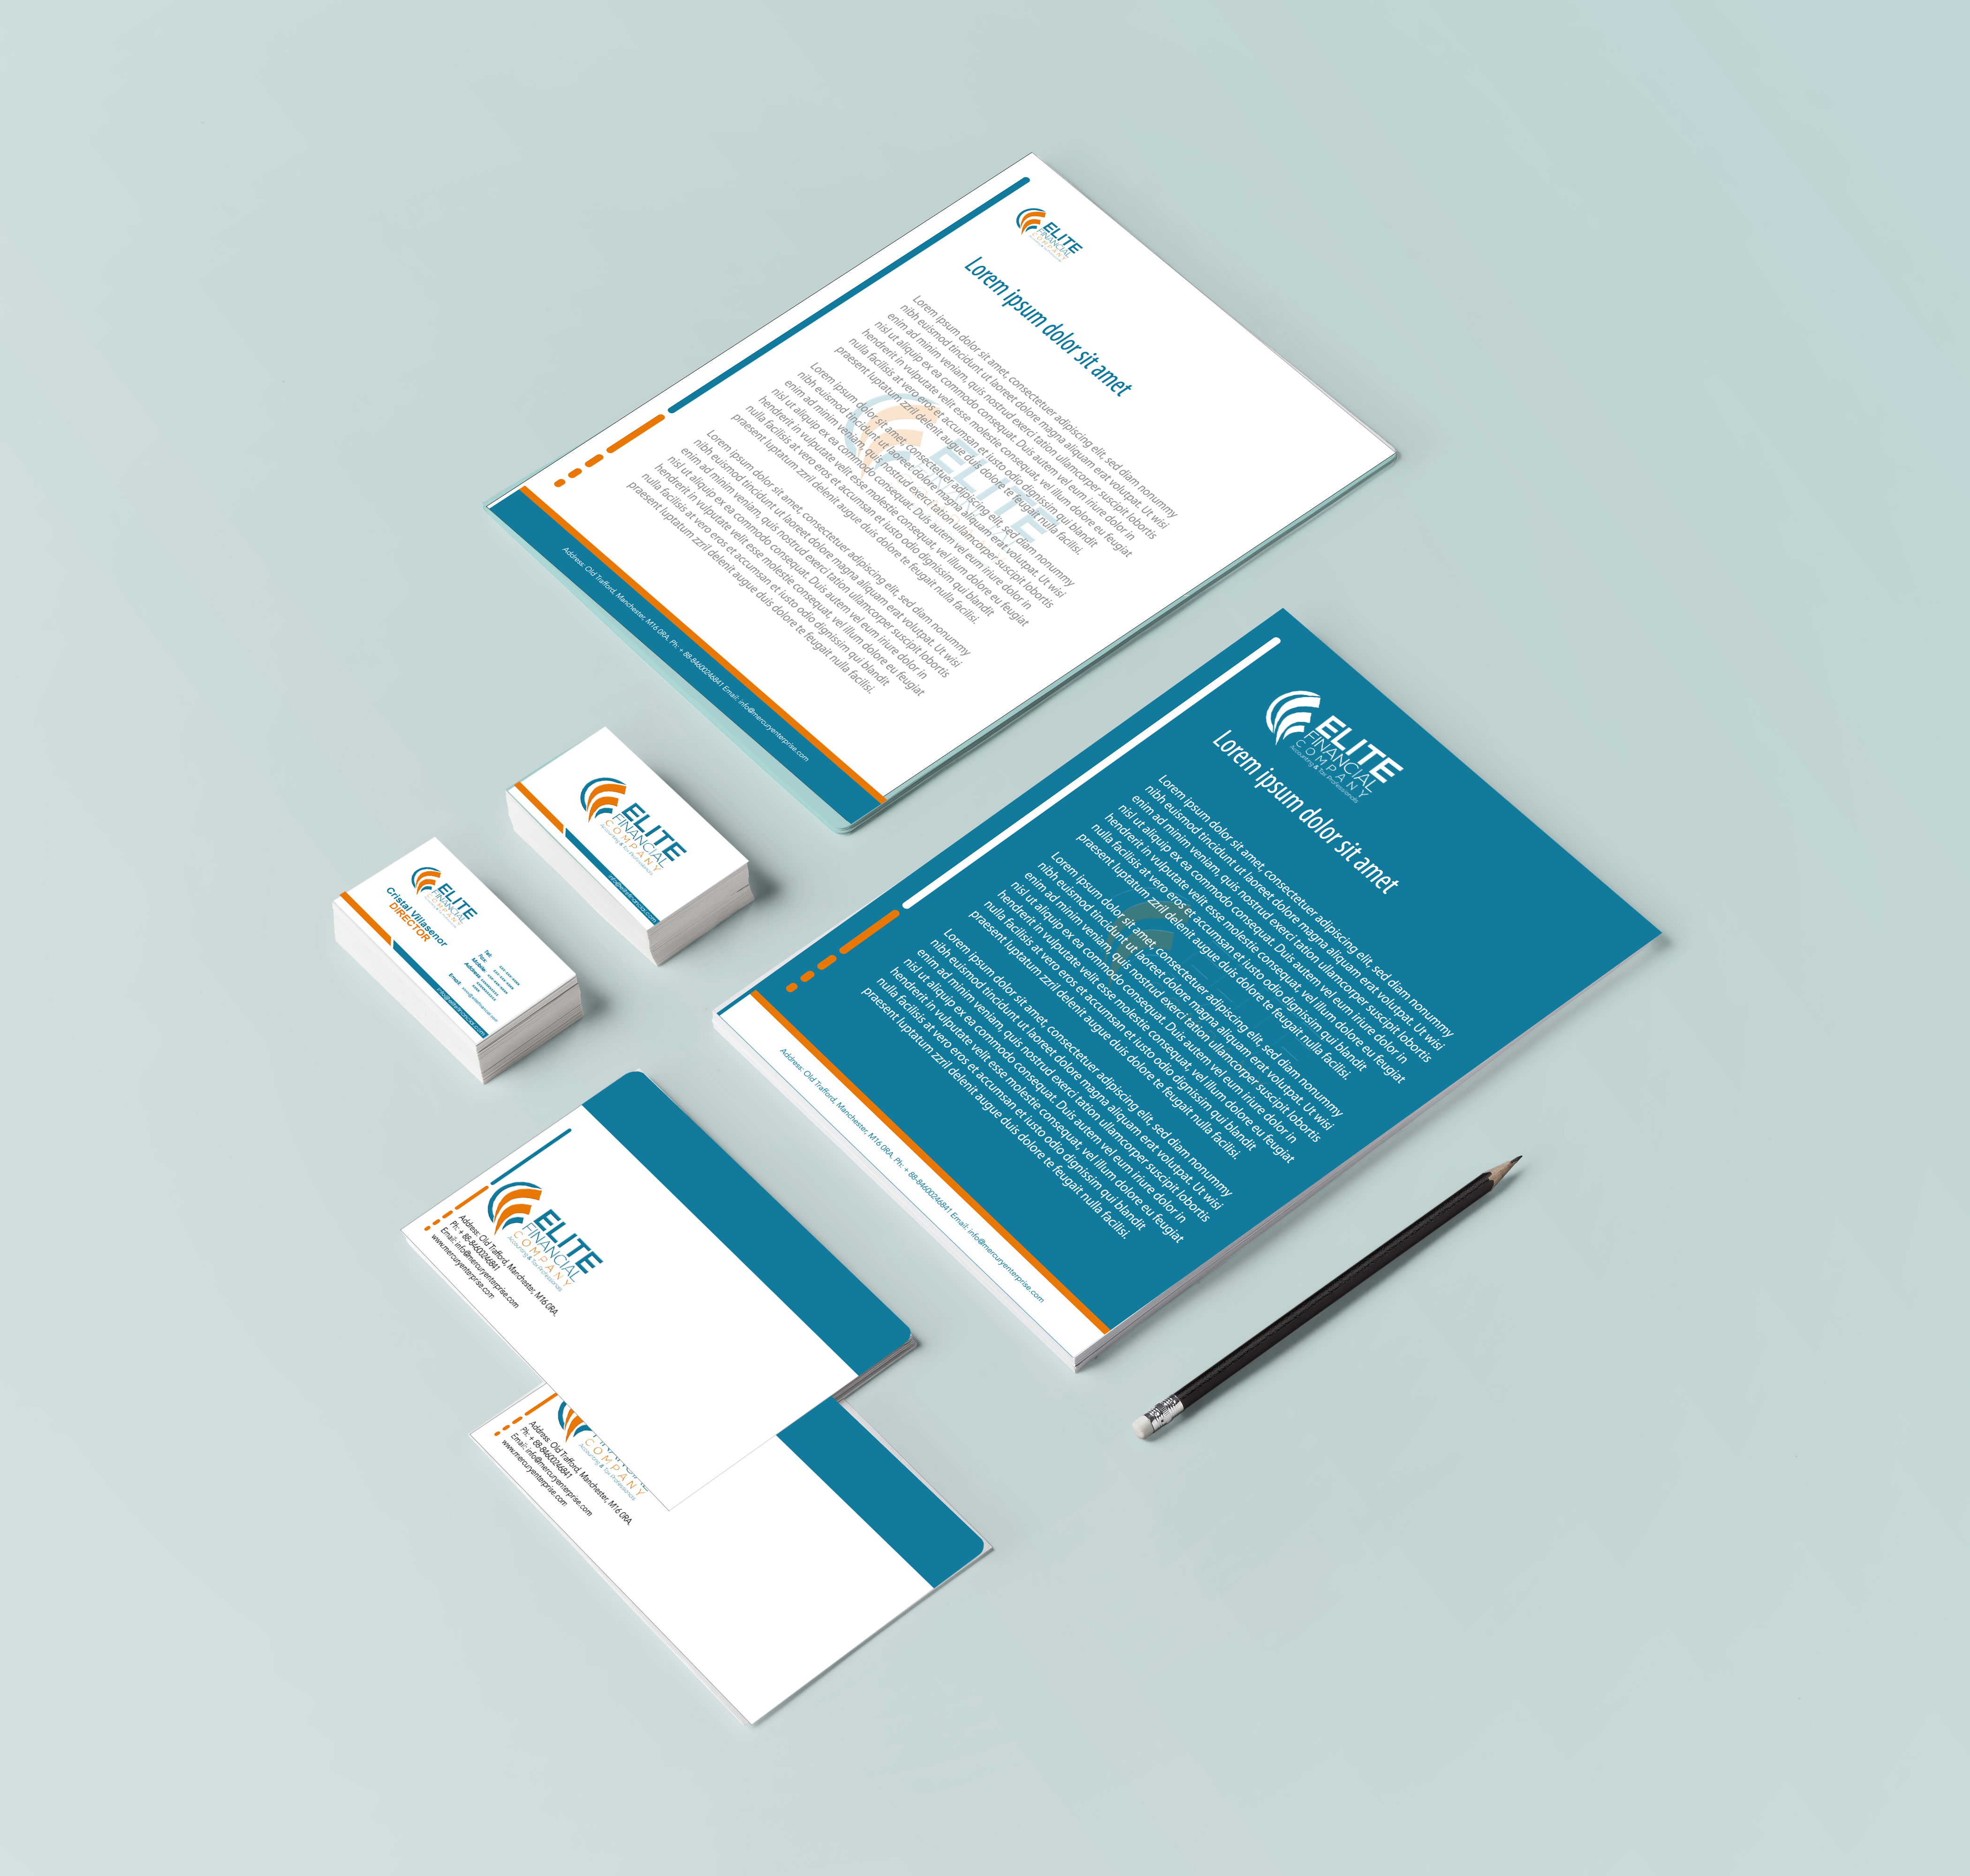 Business Card Design Contests » Imaginative Business Card Design for ...